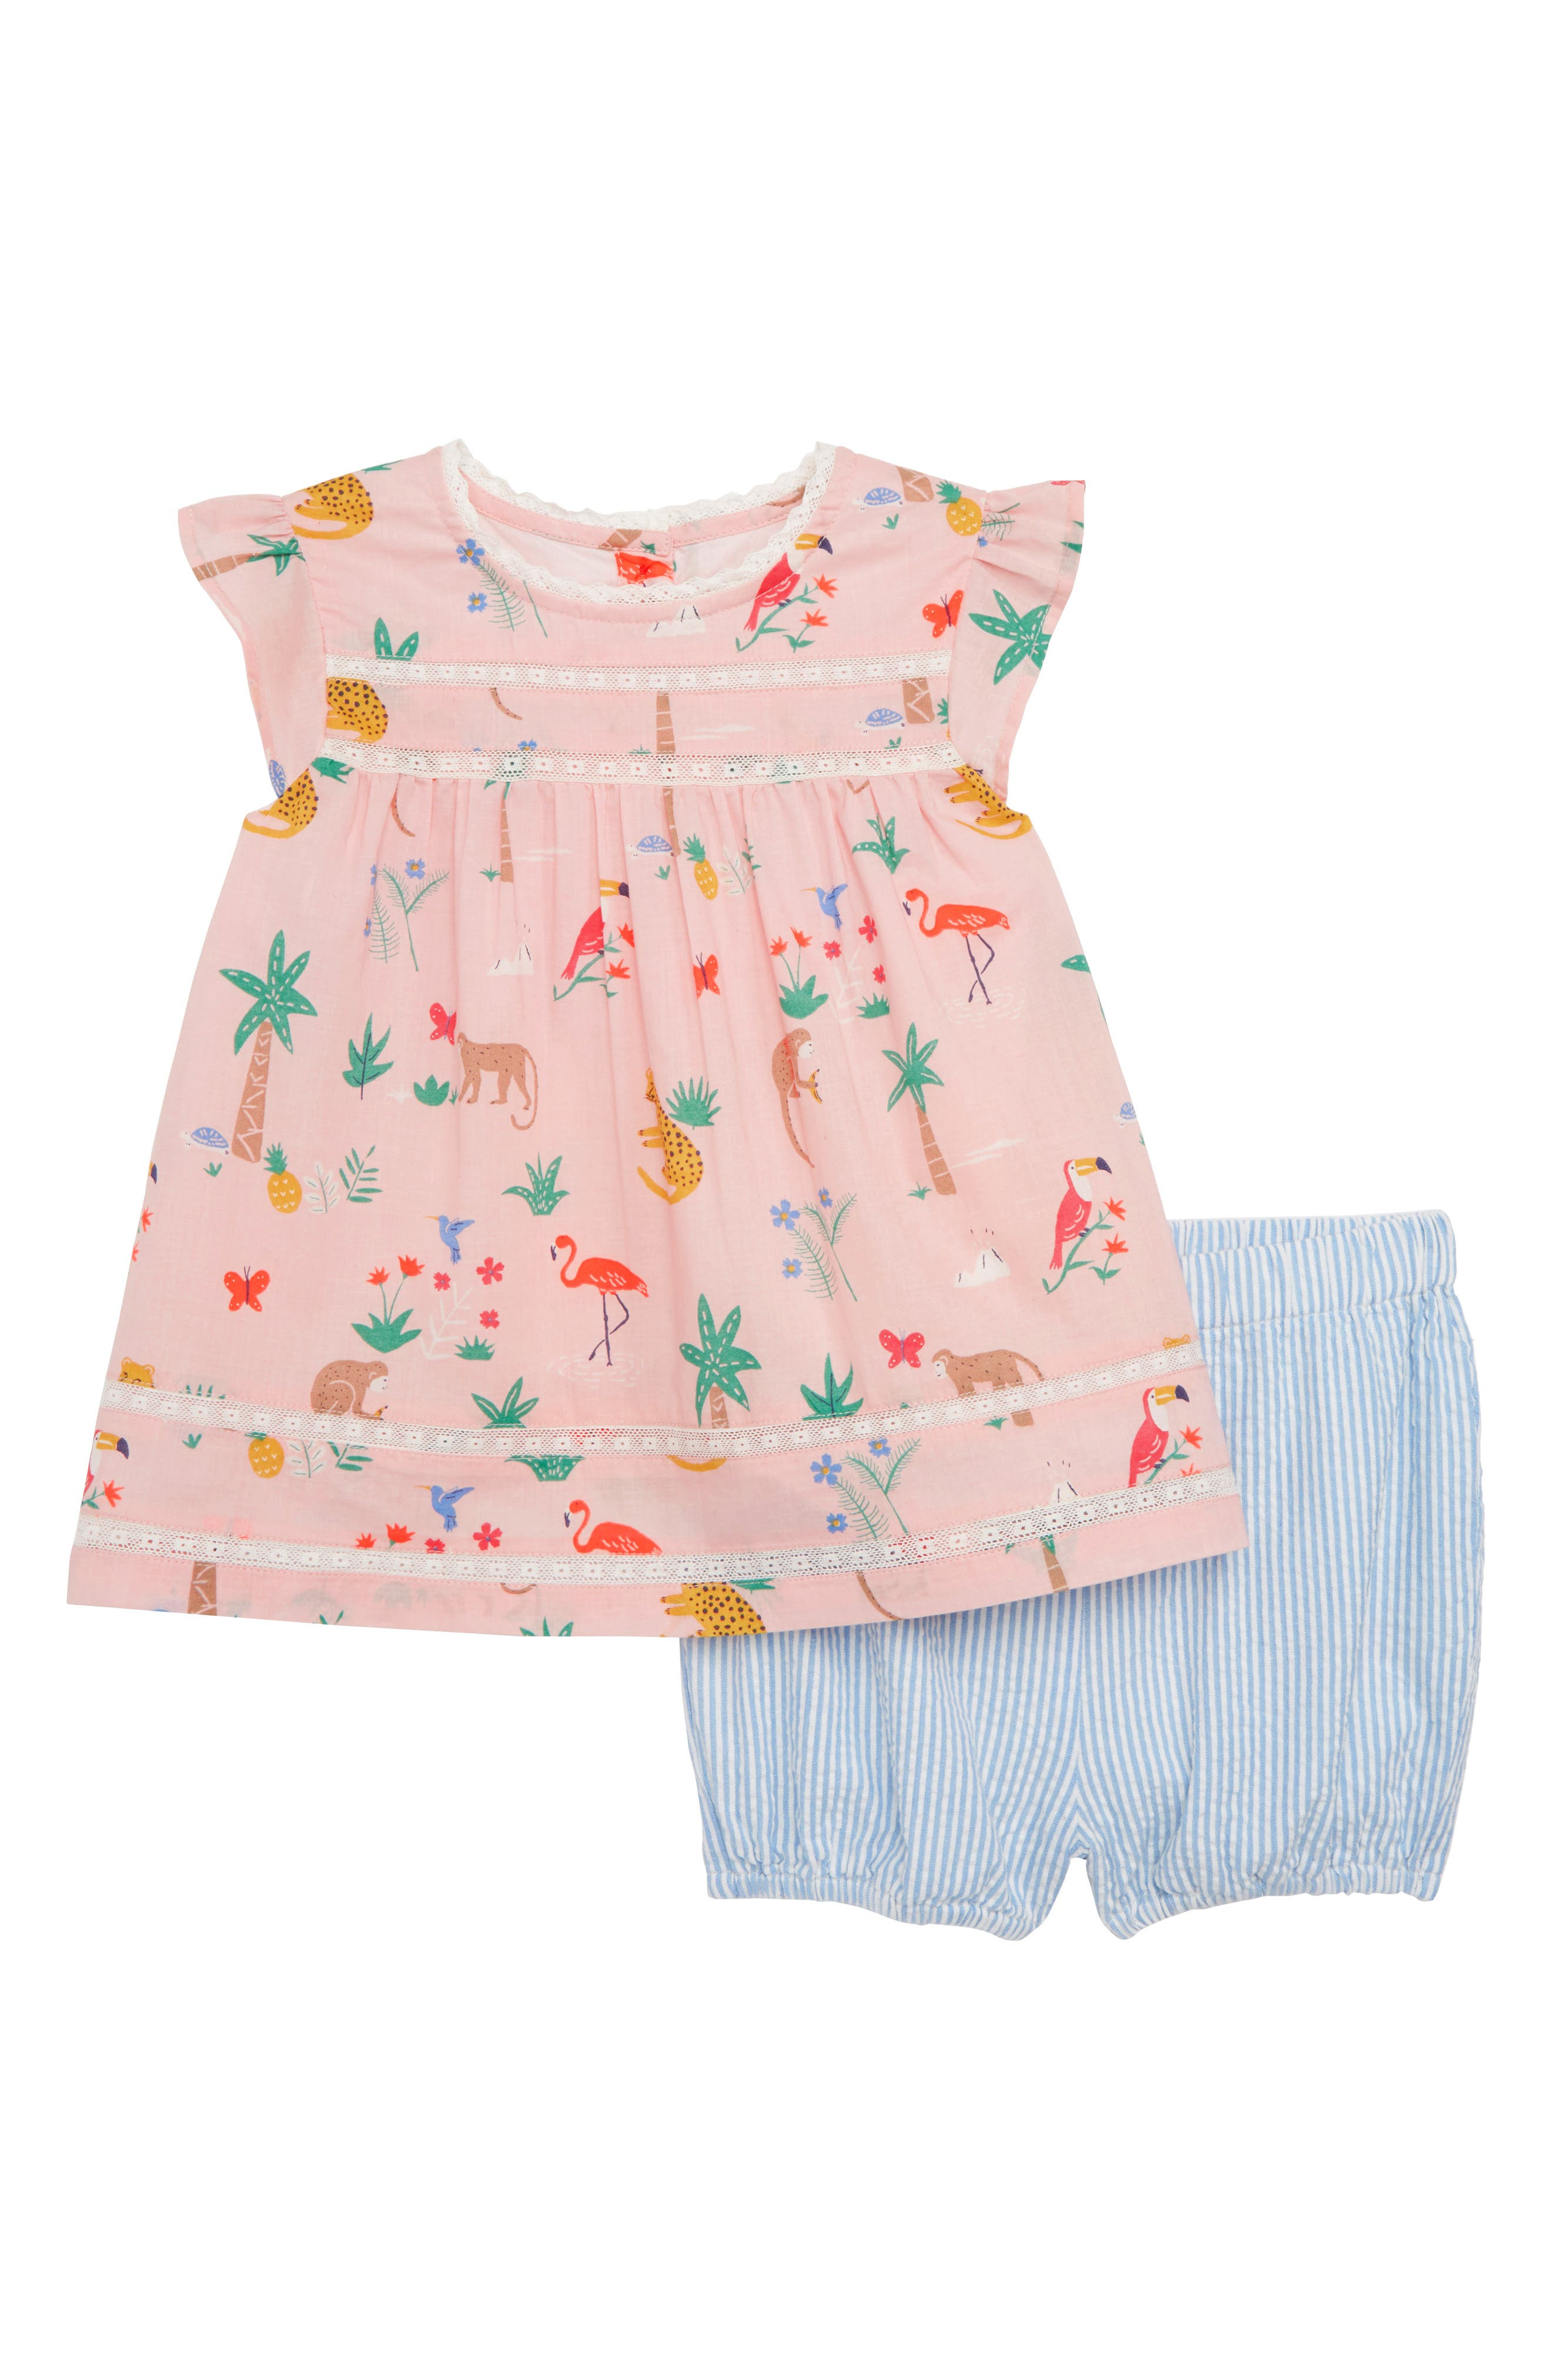 Mini Boden Sunny Days Top & Shorts Set (Baby Girls)